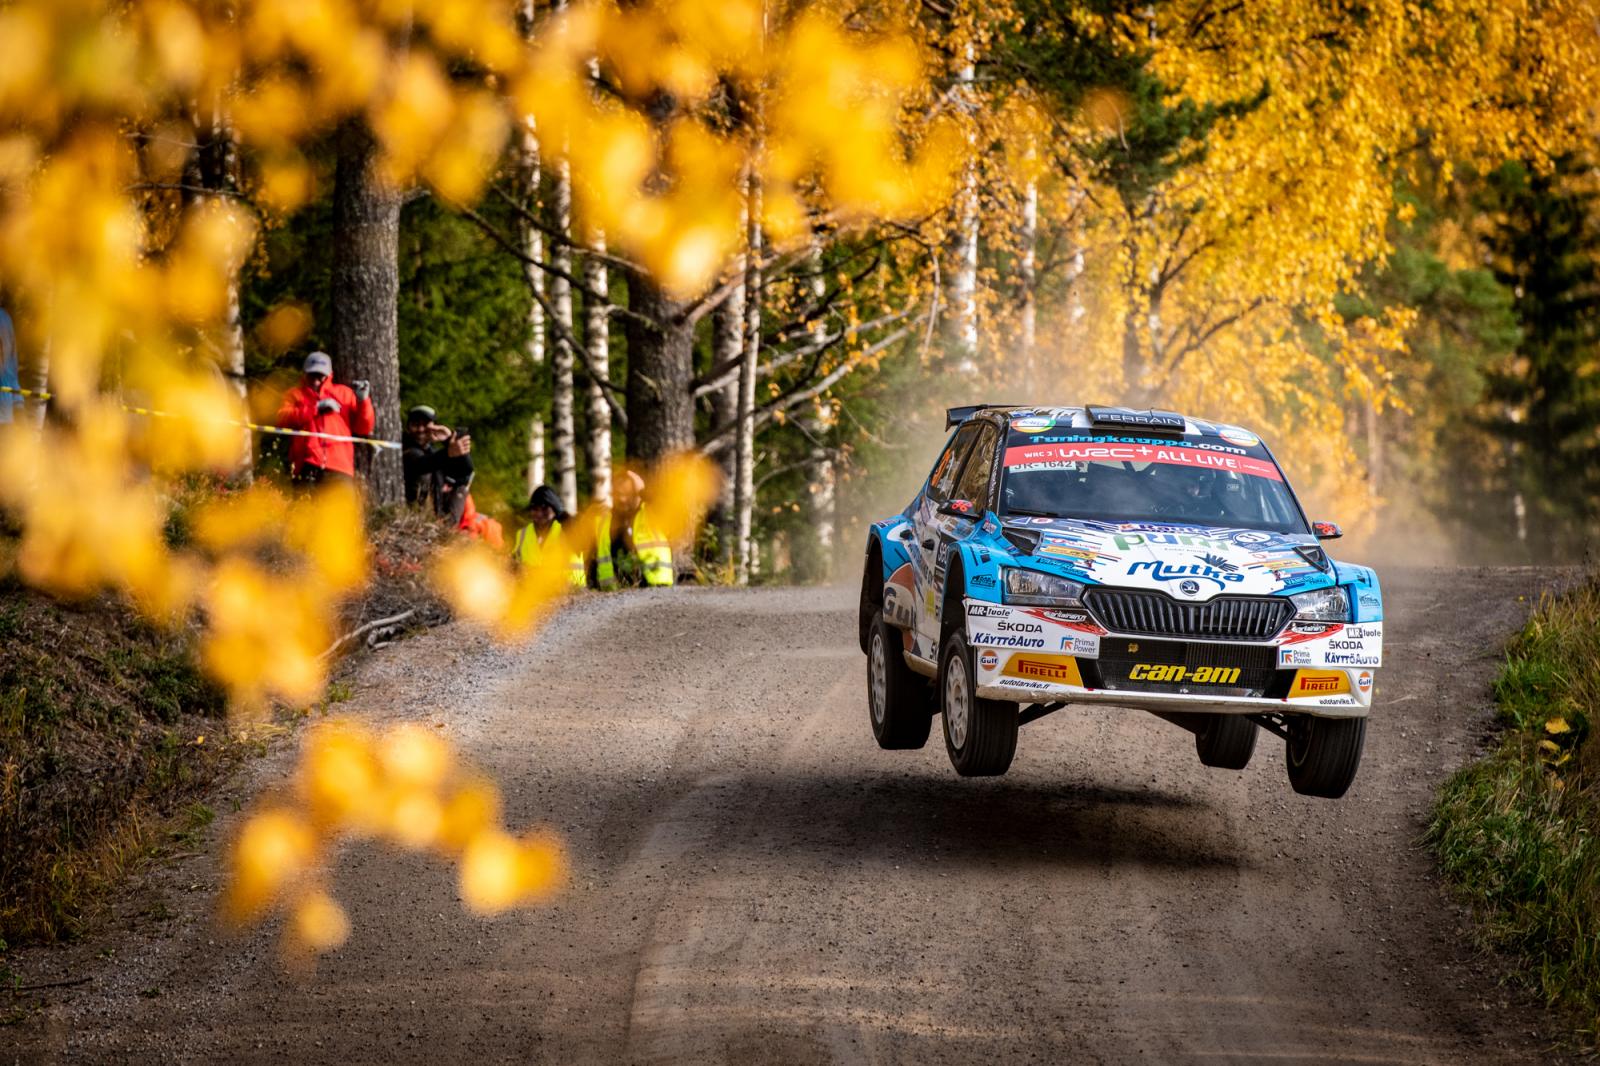 Teemu Asunmaa and Marko Salminen in WRC Rally Finland. Photo: Honza Fronek/Rally-Mania.cz.